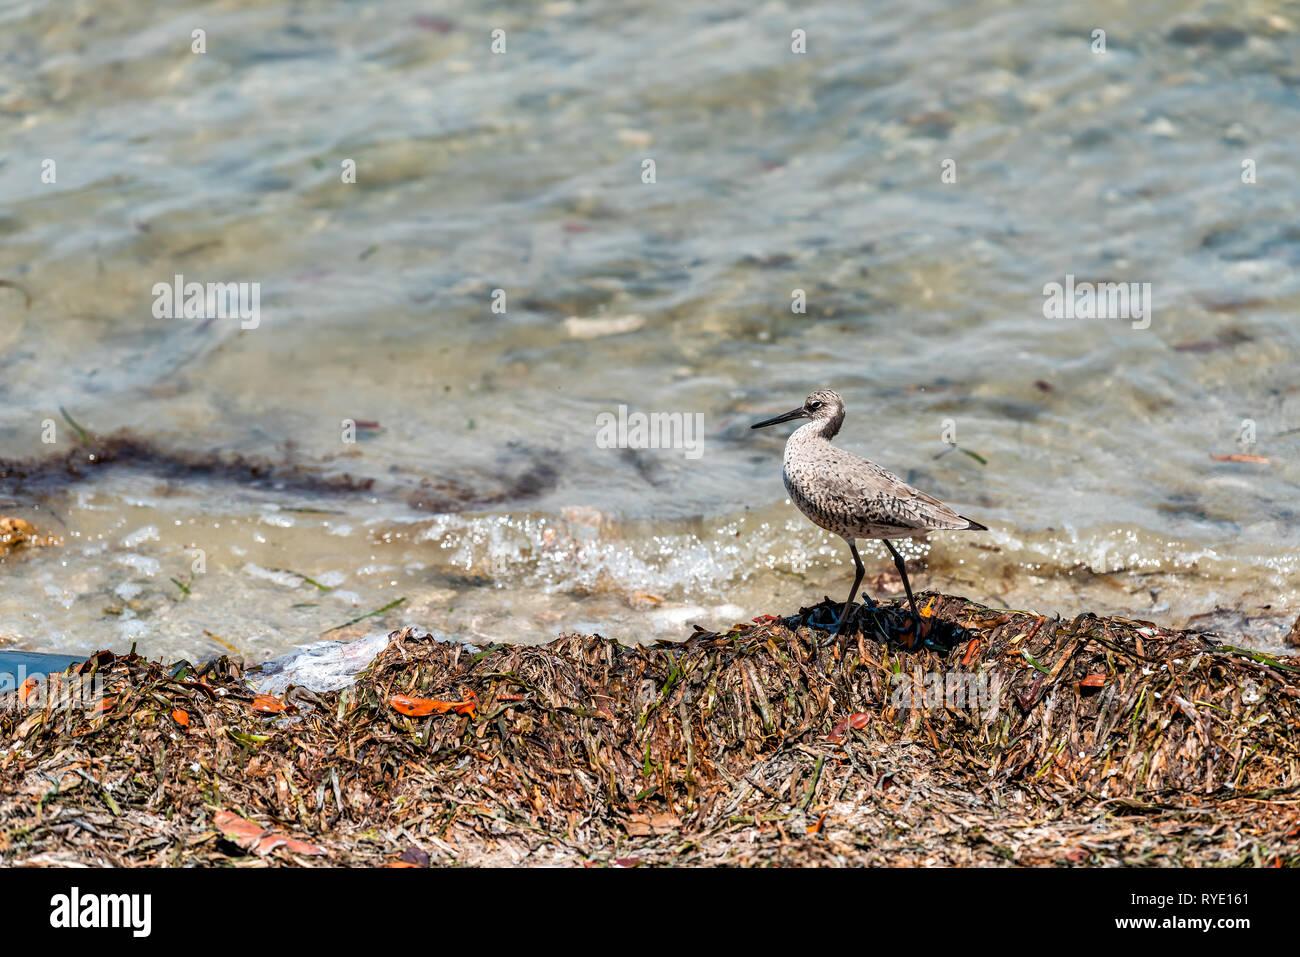 Sanibel Island in Florida bay sea near beach coast with closeup of willet bird walking by water Stock Photo